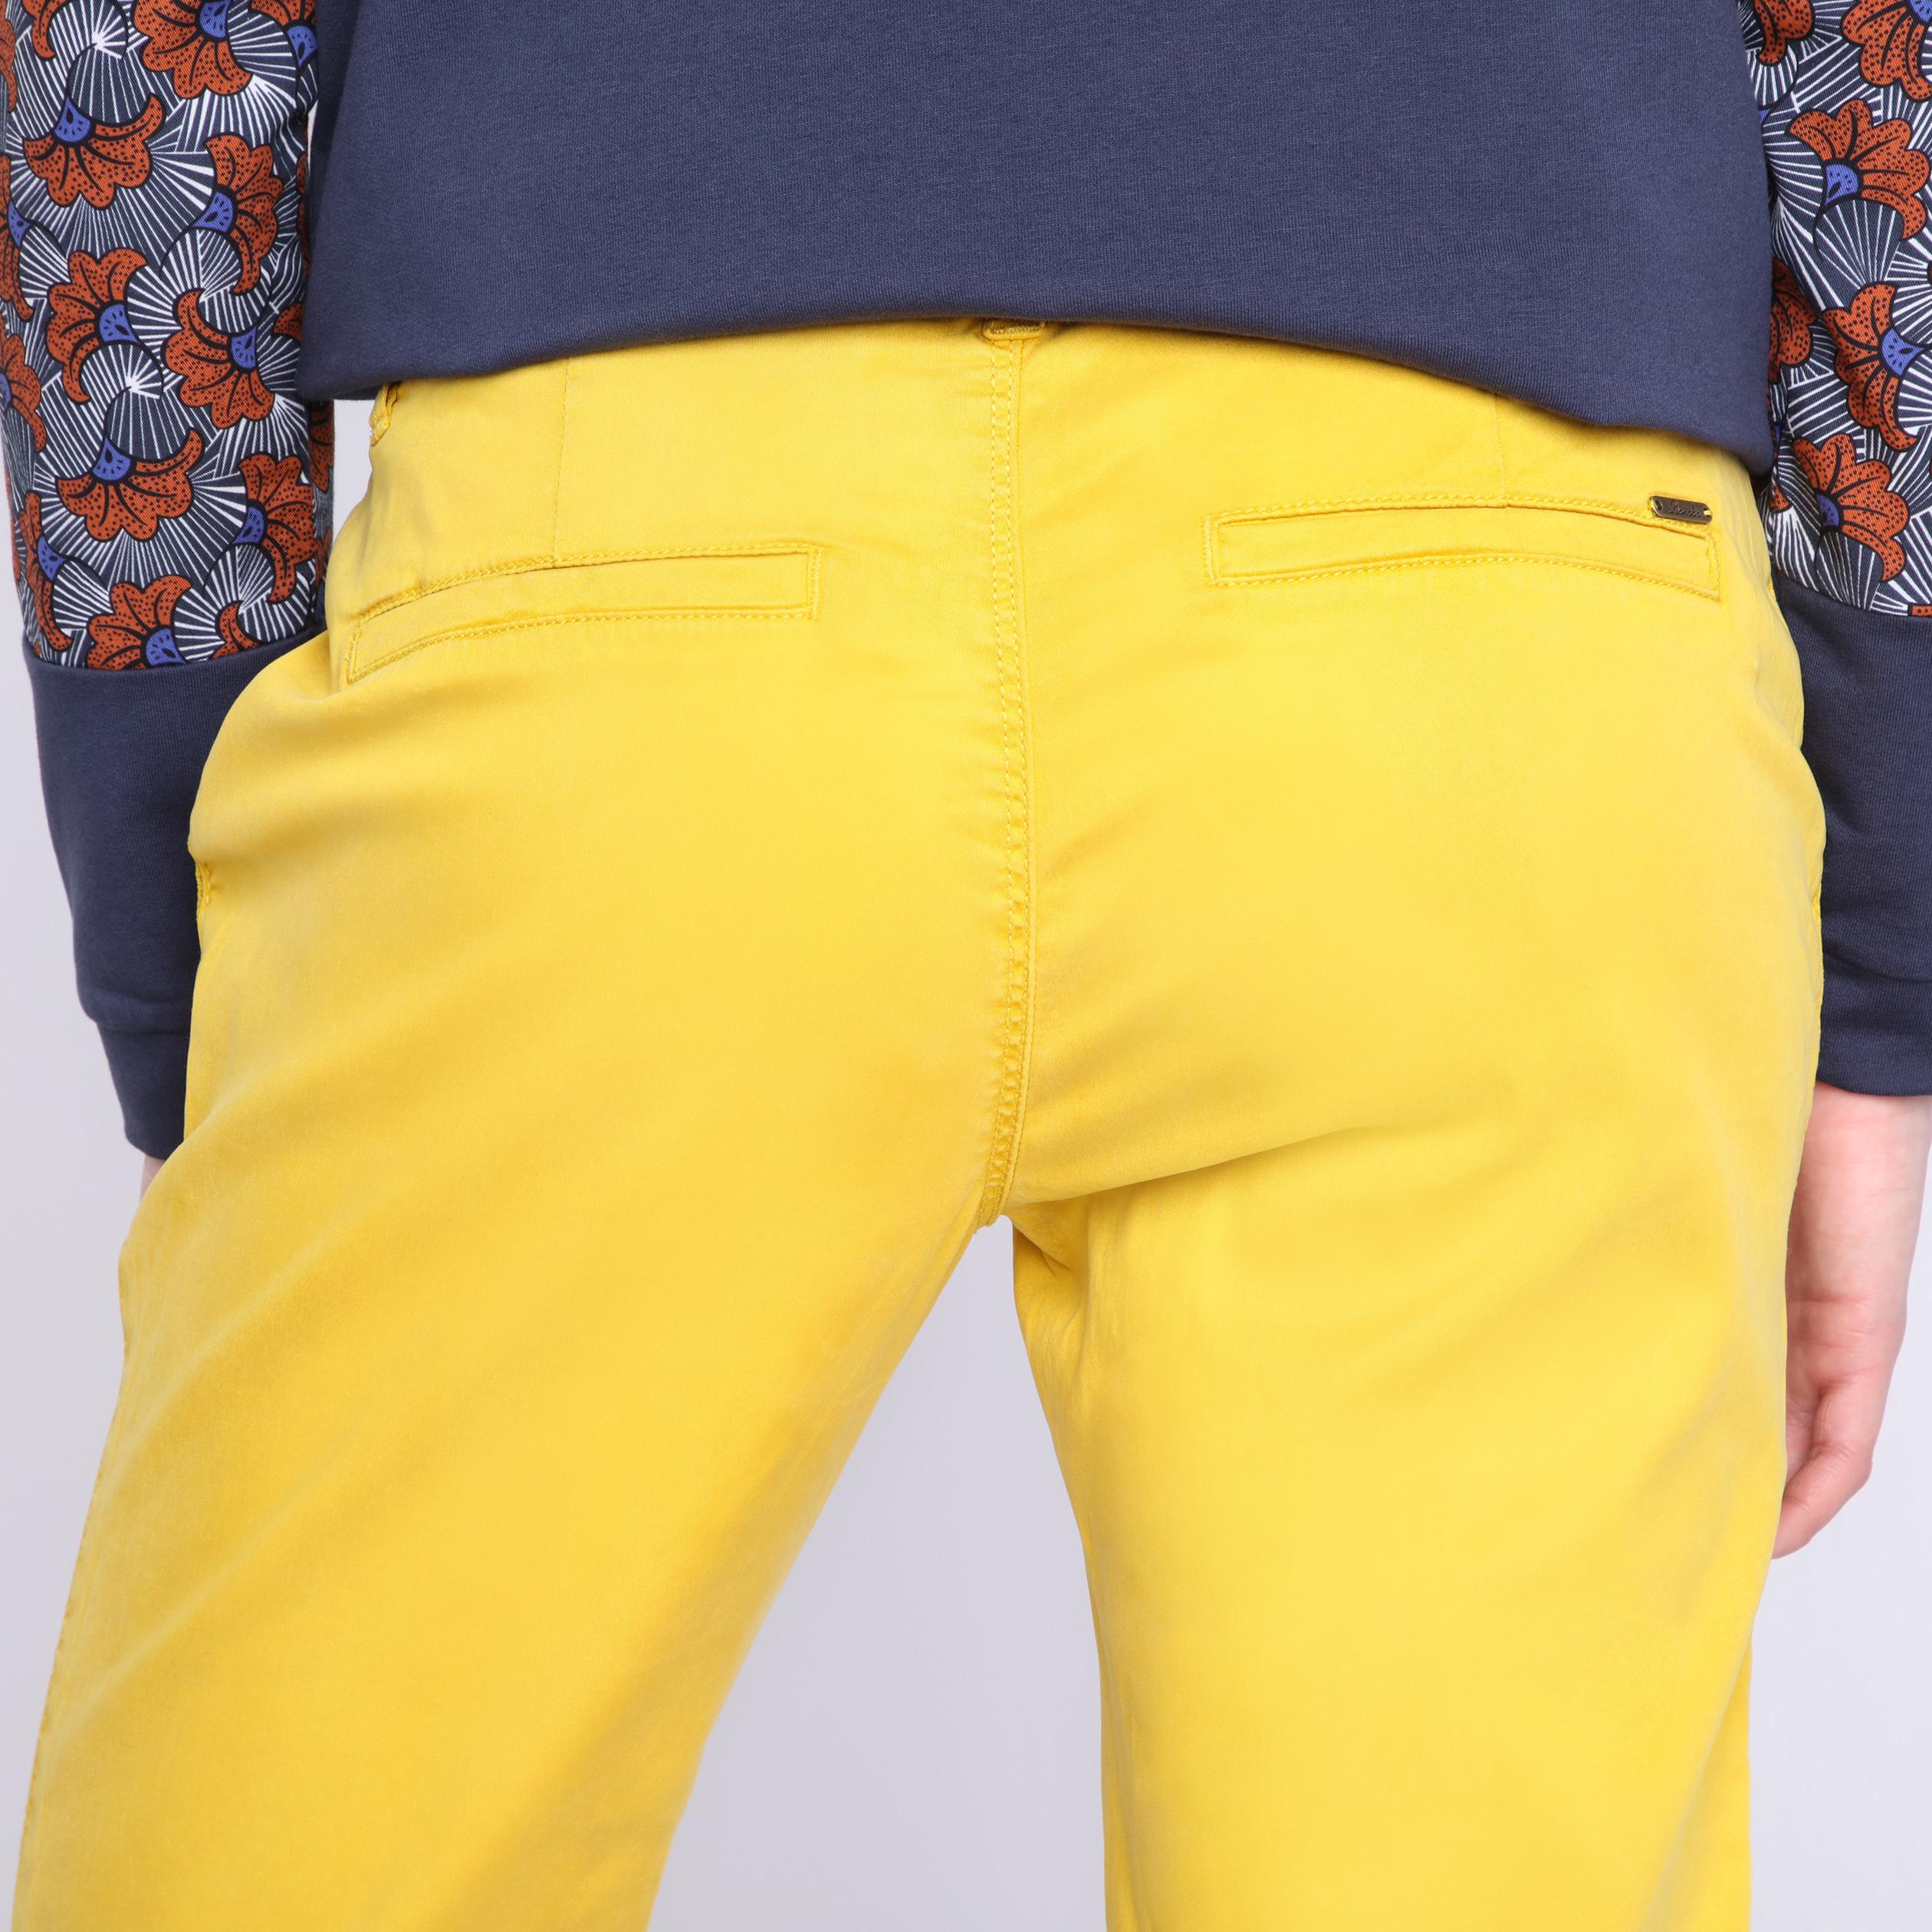 Amarillo Mujer Chino Pantalones Lemon Ftkcu51lj3 Instinct rxBoWeQdC